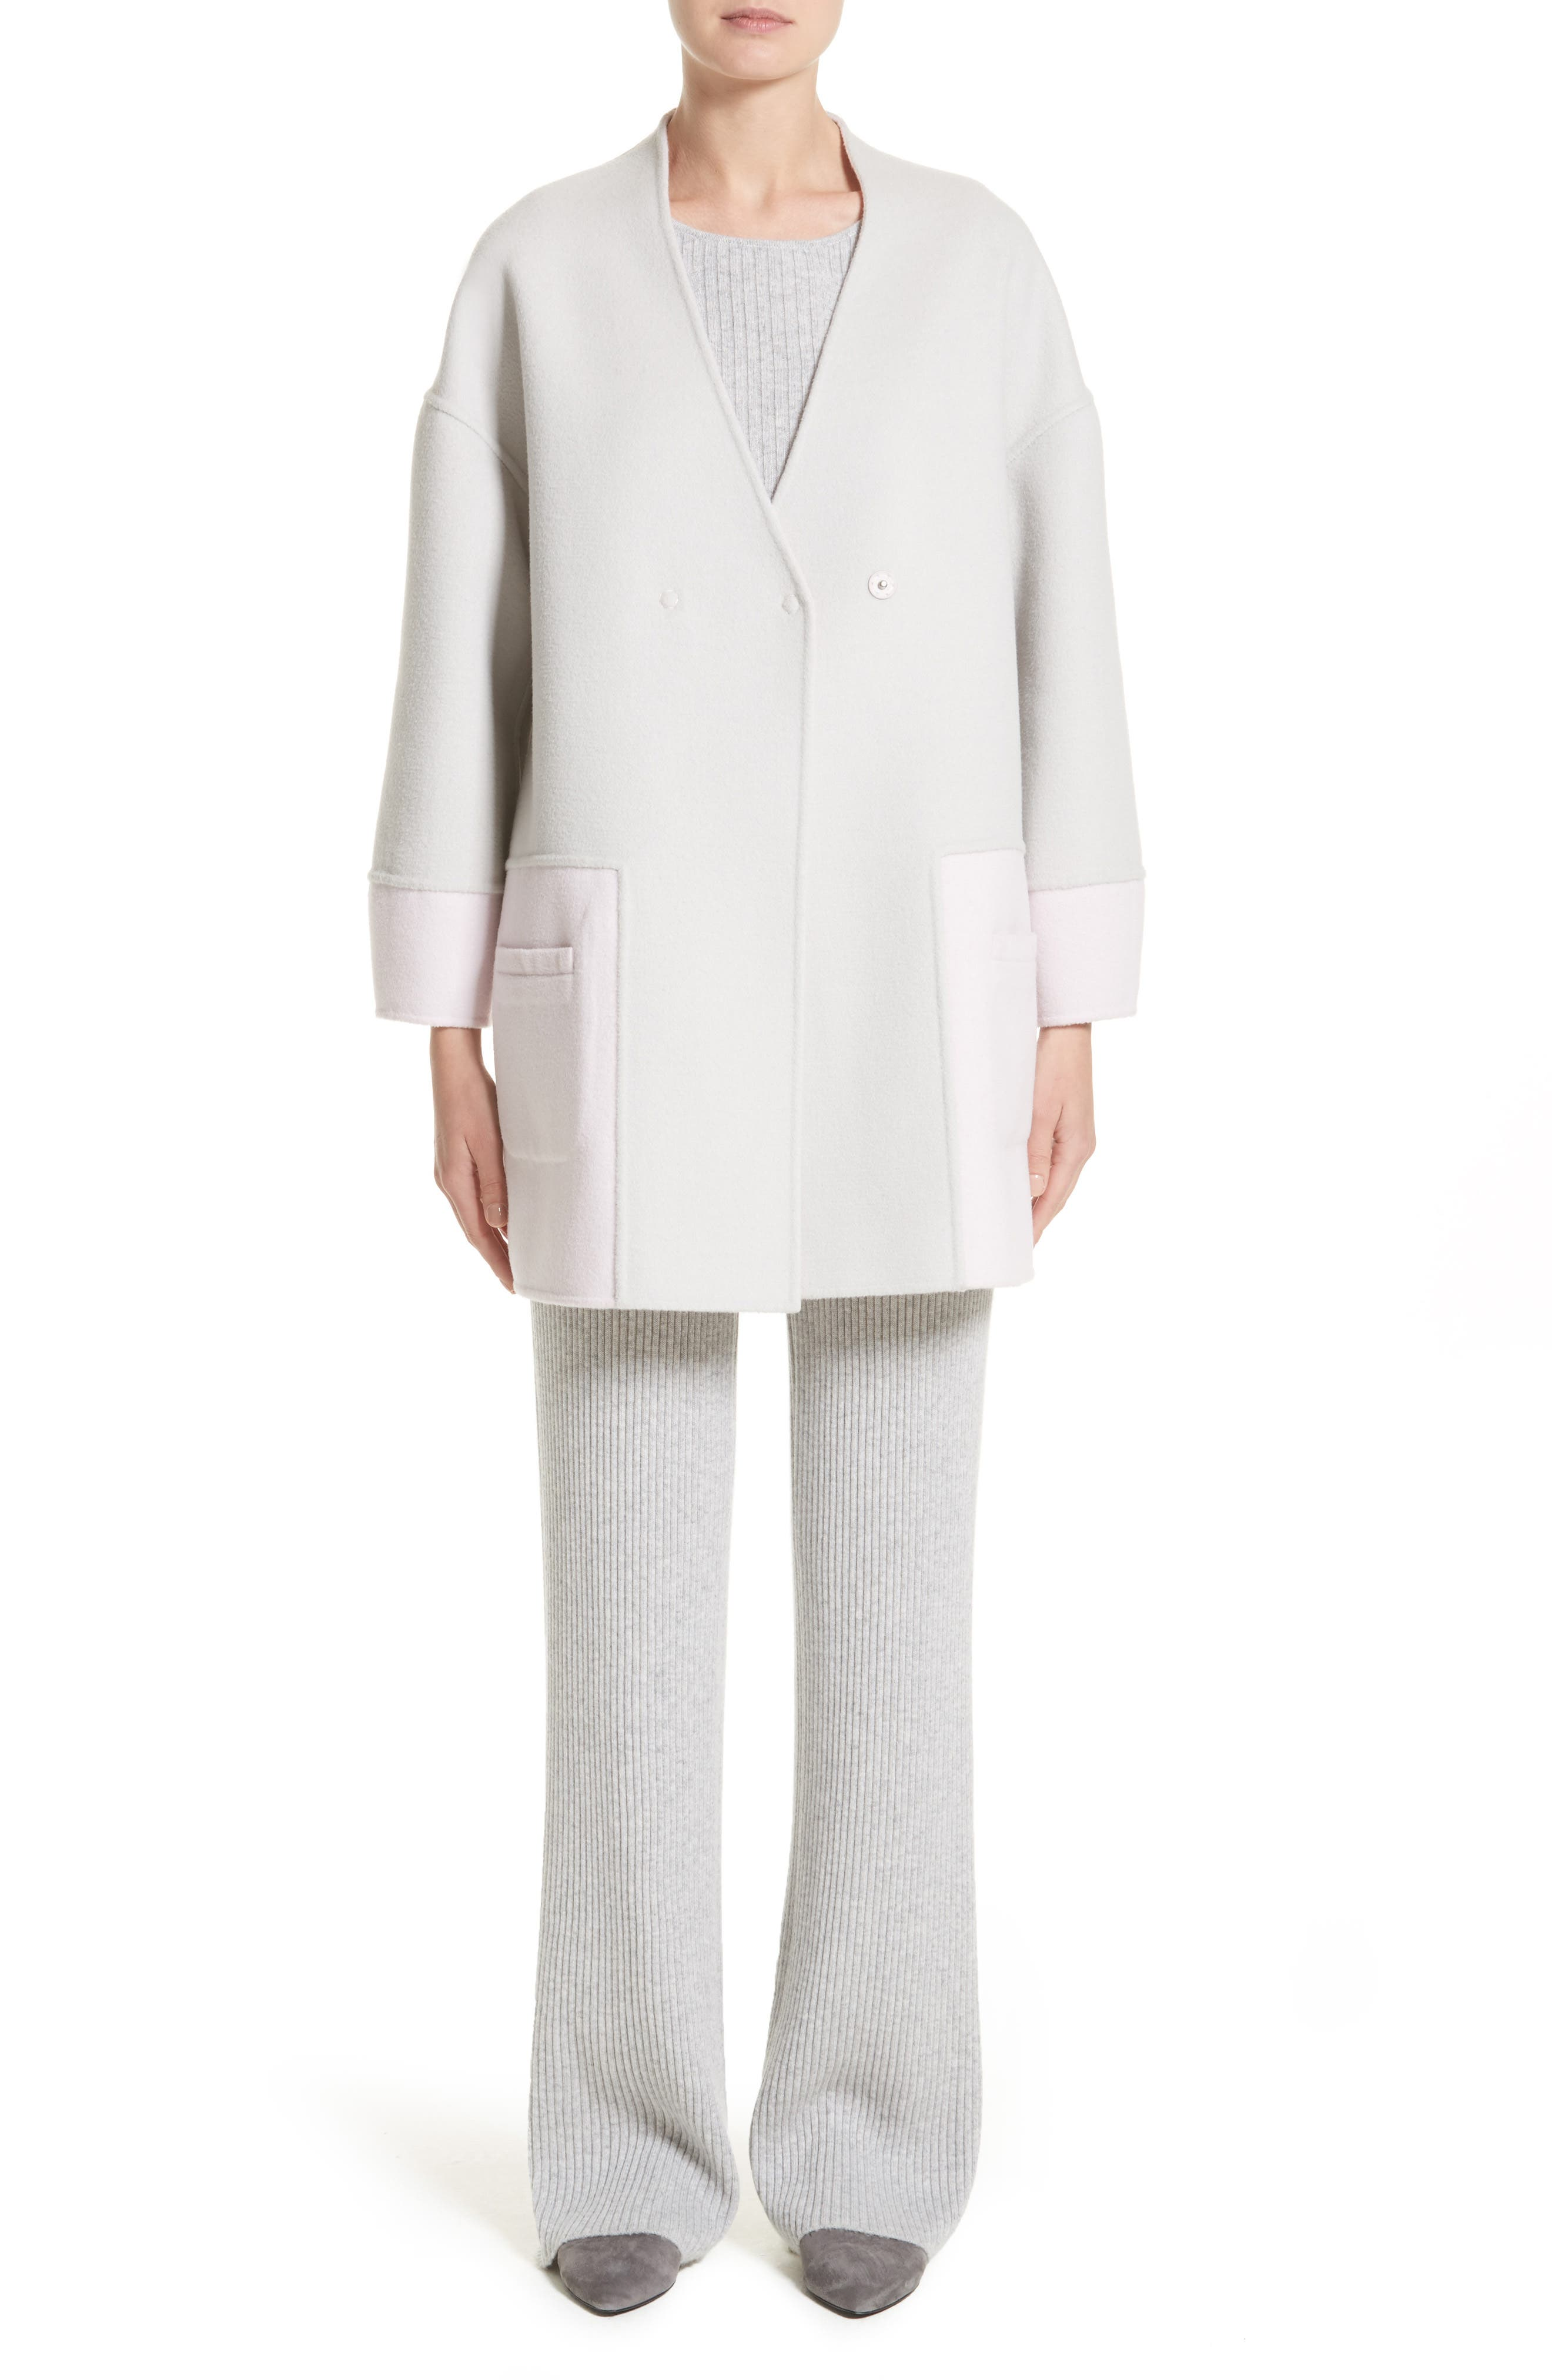 Reversible Wool Blend Cocoon Coat,                             Alternate thumbnail 9, color,                             Petal/ Light Grey Melange